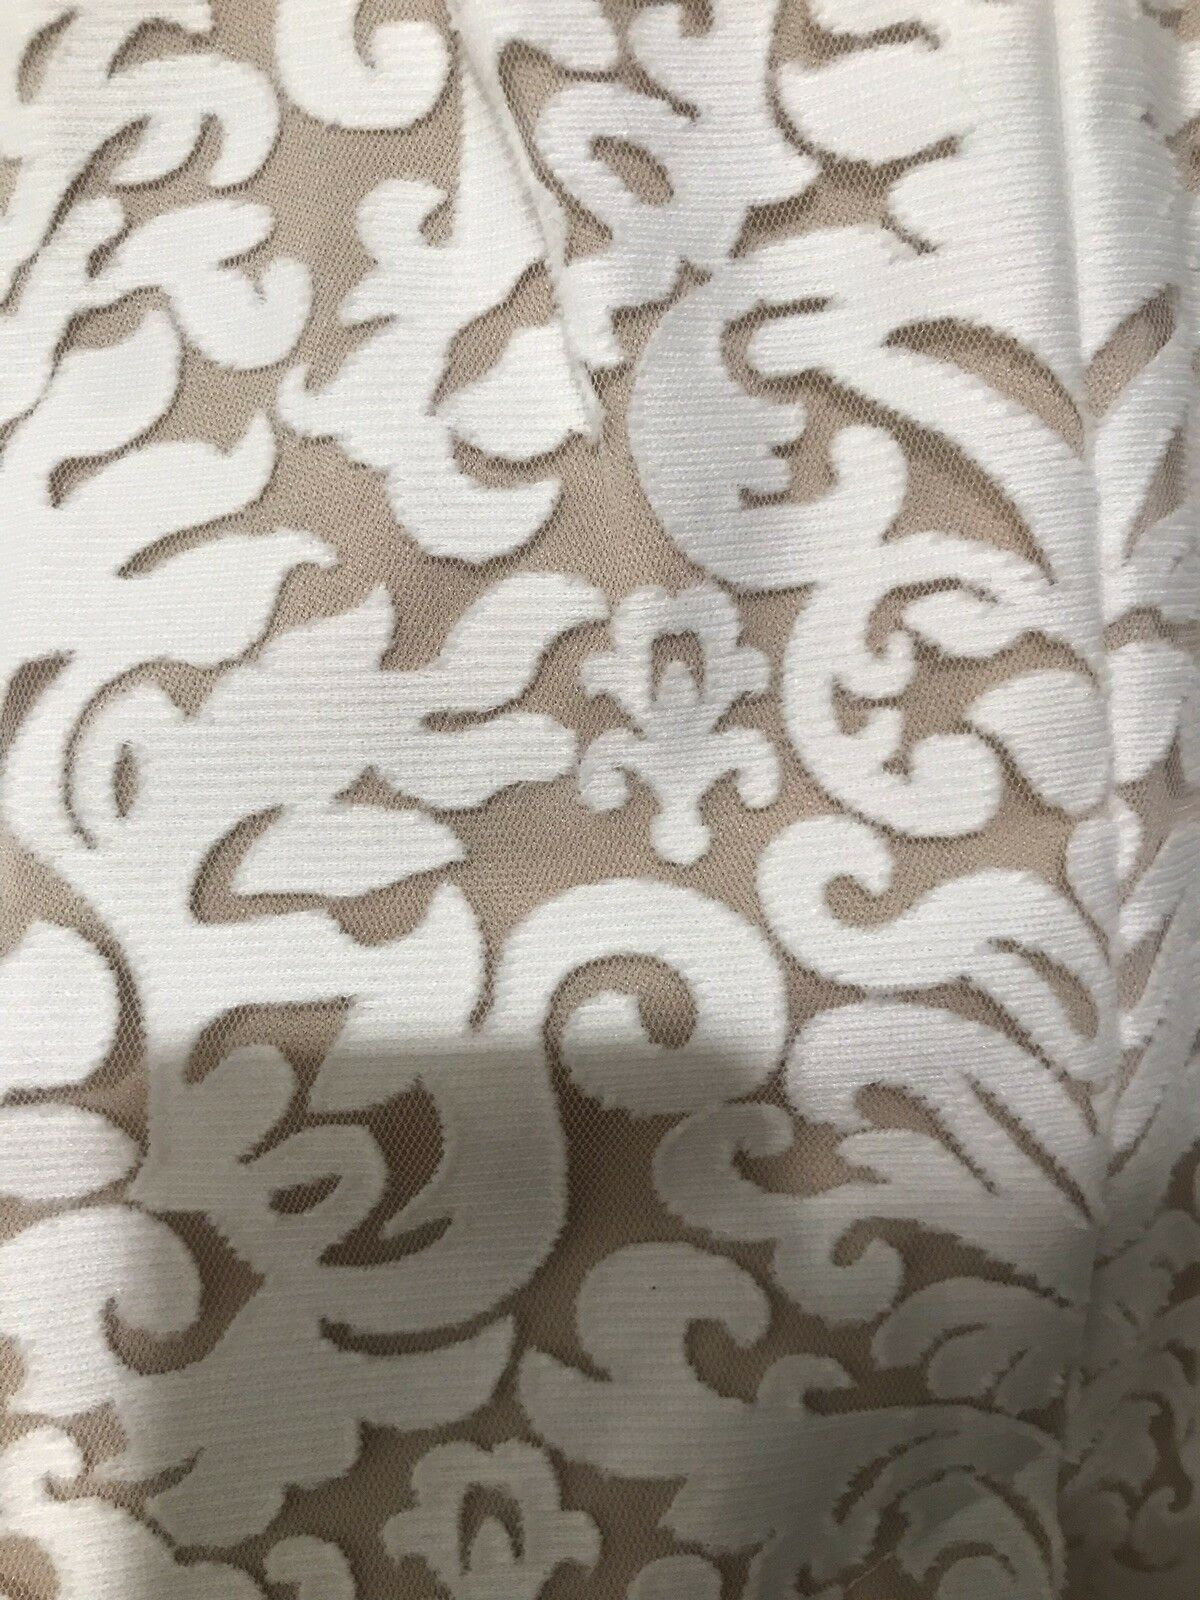 Xscape Kalte Schulter Spitzenkleid Spitzenkleid Spitzenkleid Glockenärmel Petite Weiß Hautfarben 2P Neu 4793ef